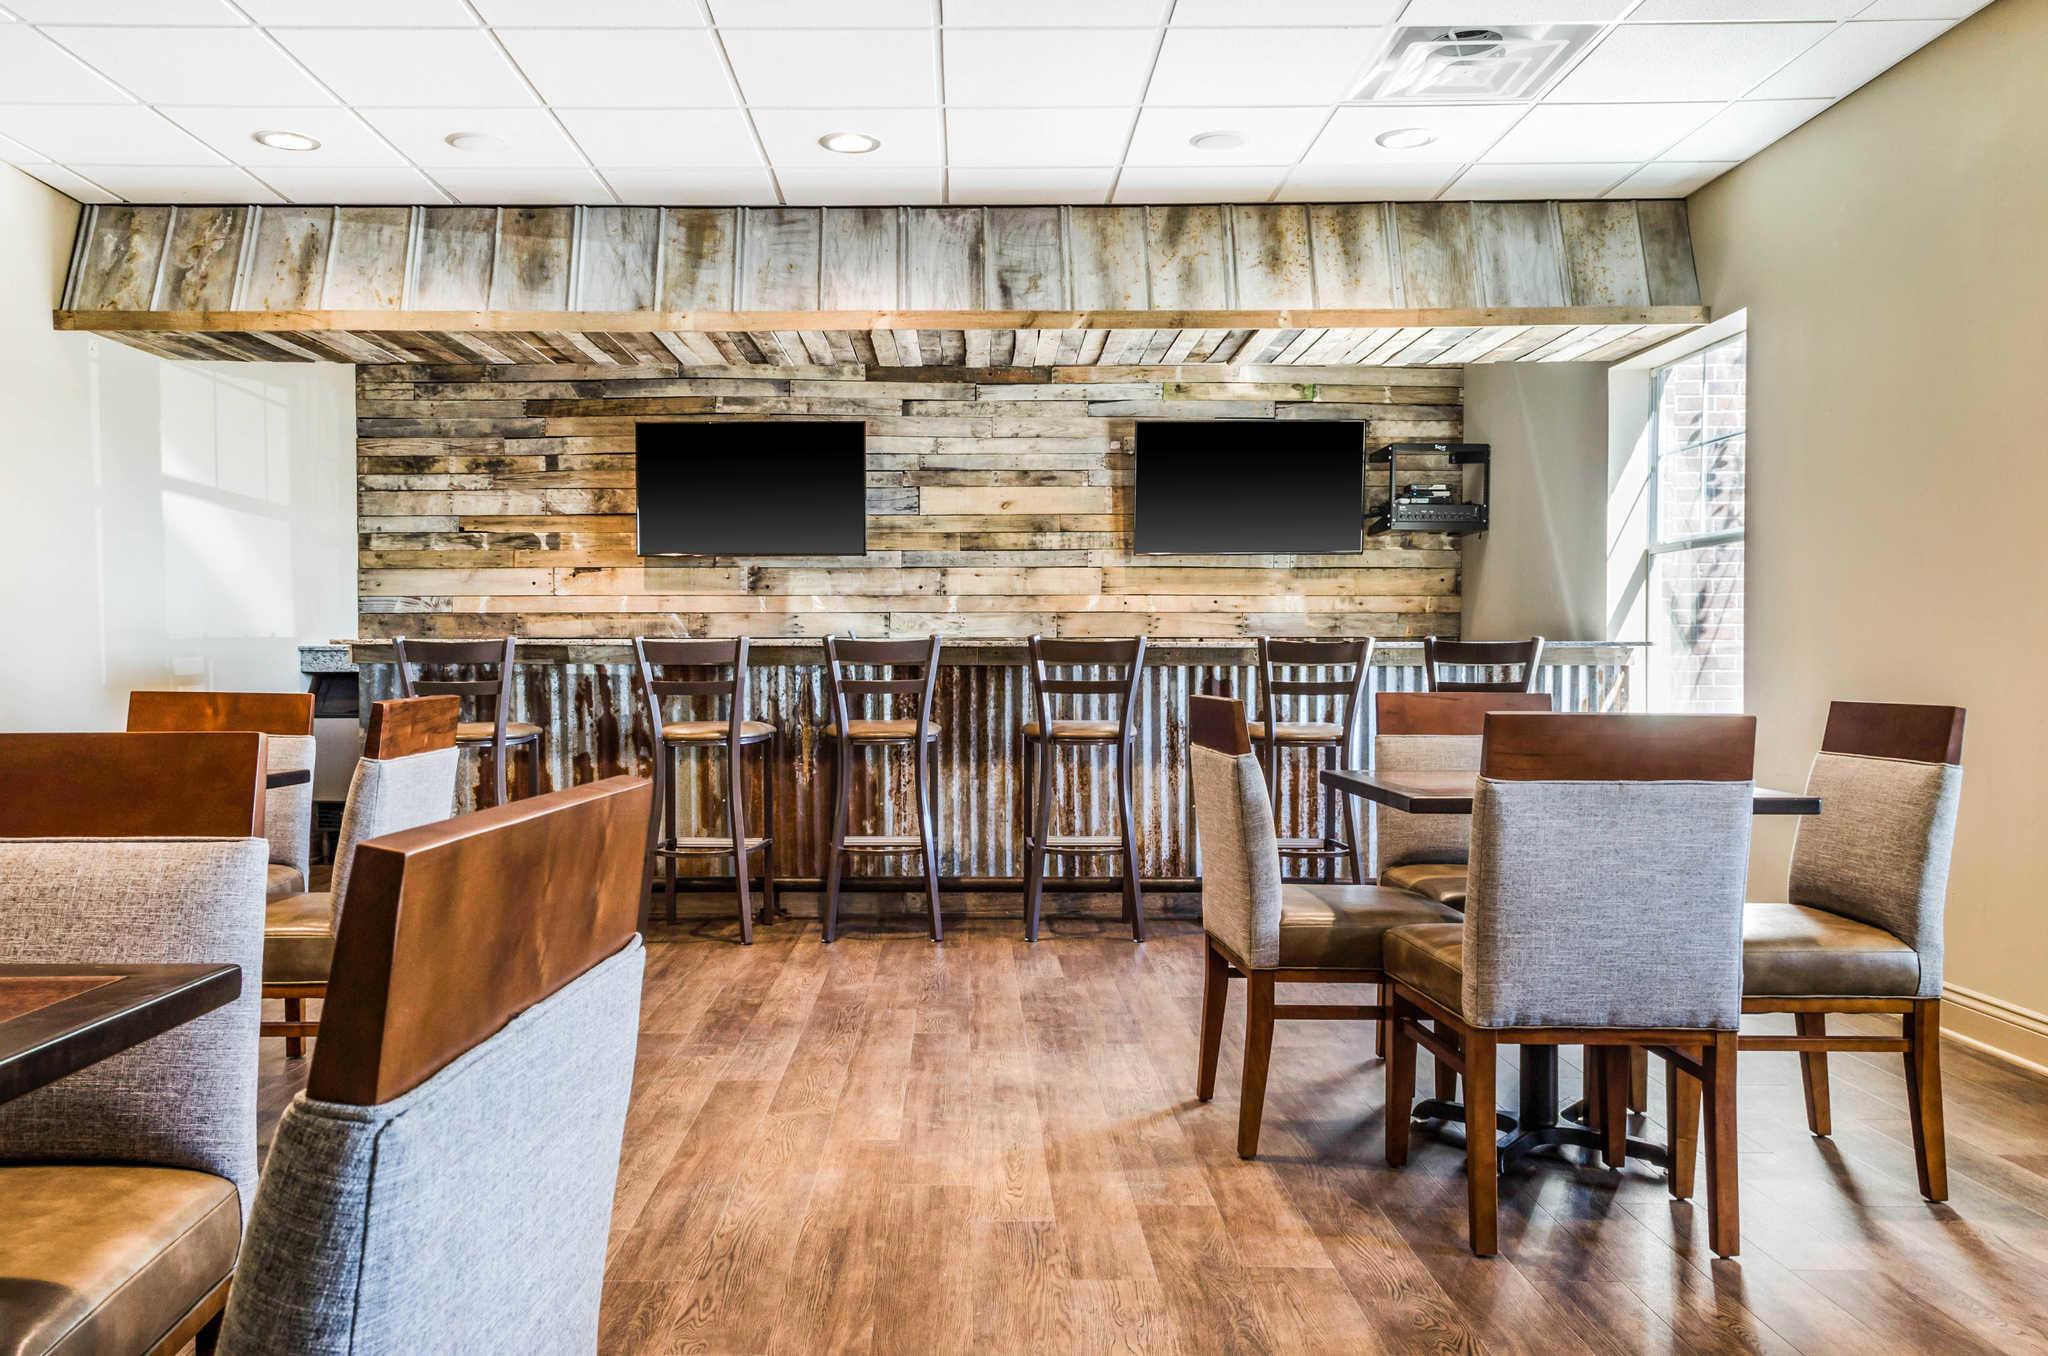 MainStay Suites Hackberry Sportsman's Lodge image 26